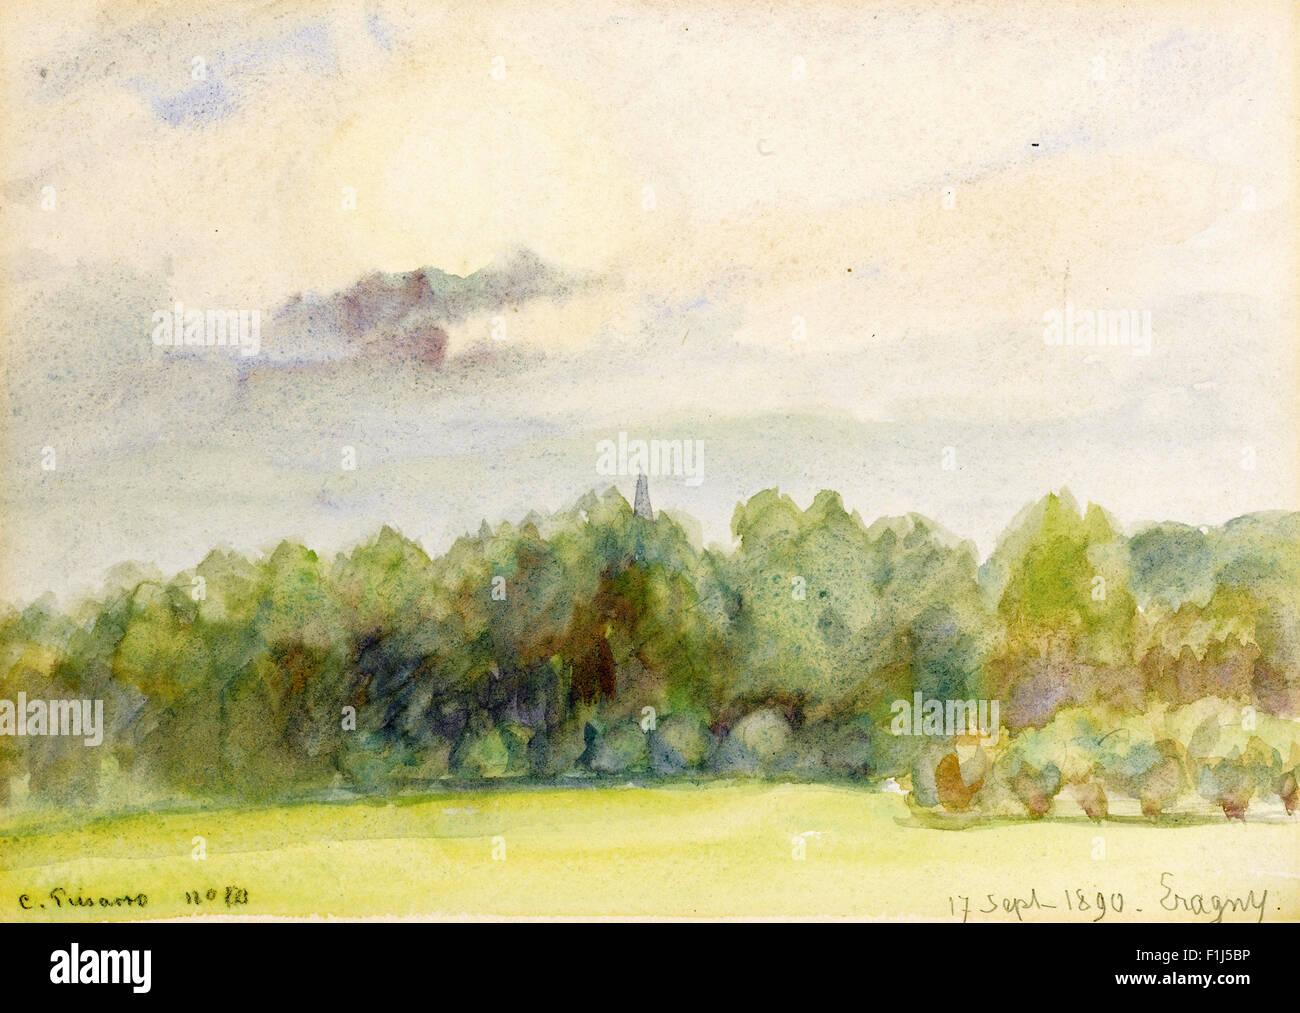 Camille Pissarro - Paysage à Eragny - Stock Image